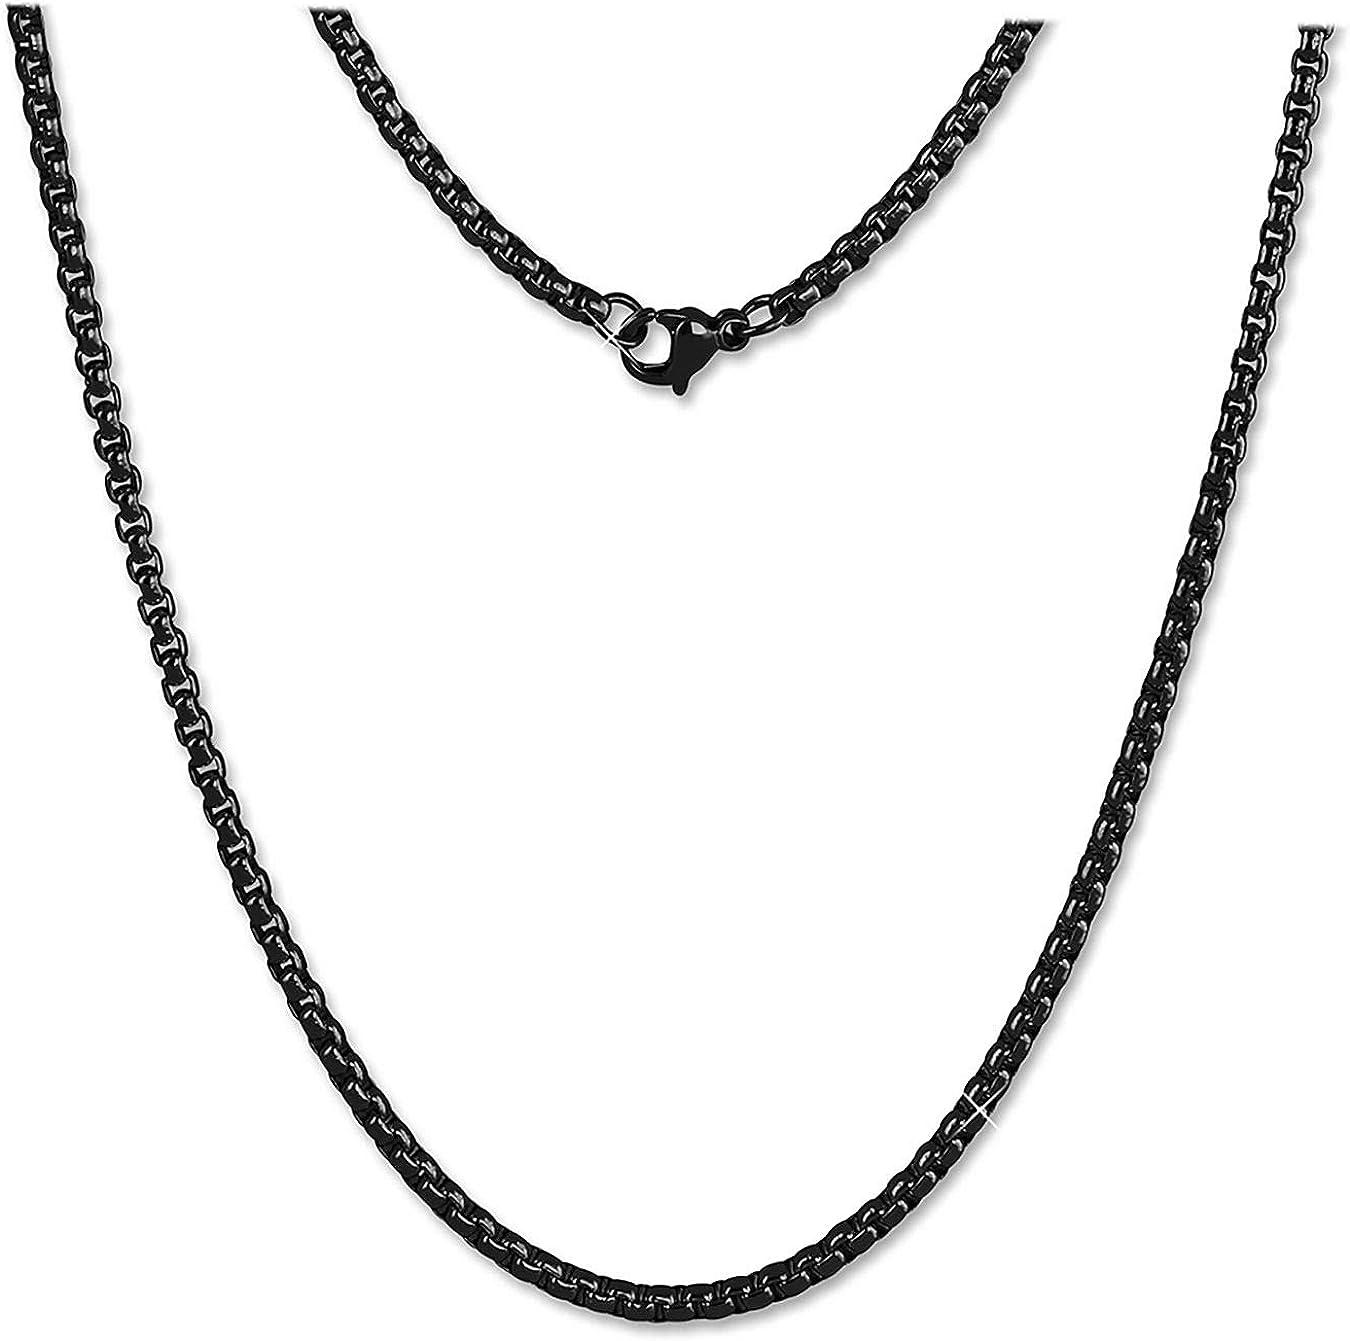 Amello collar cerámica doble sabe señora joyas de acero inoxidable eskx05w